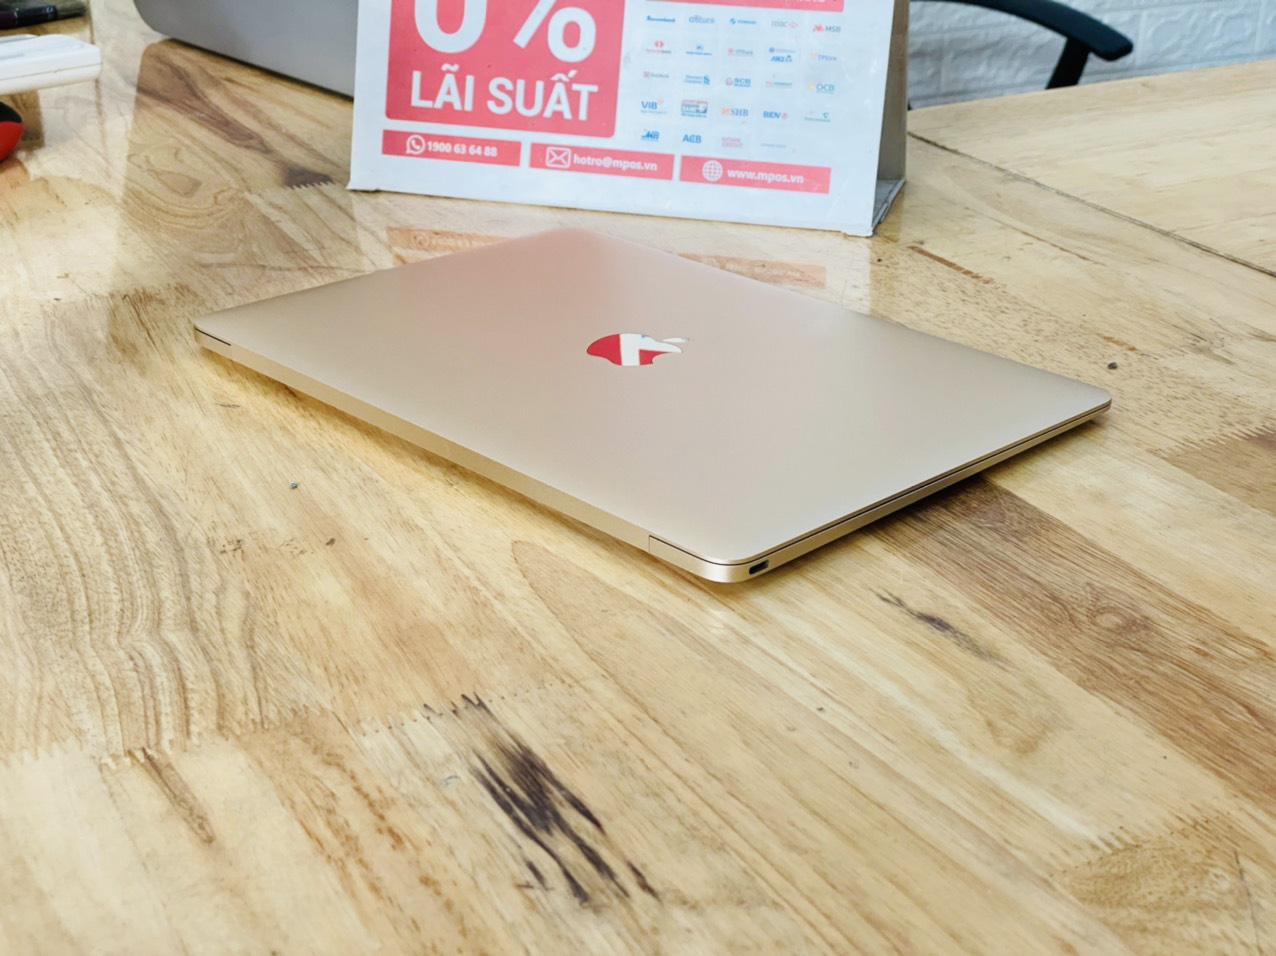 Macbook Retina 12-inch Early 2016